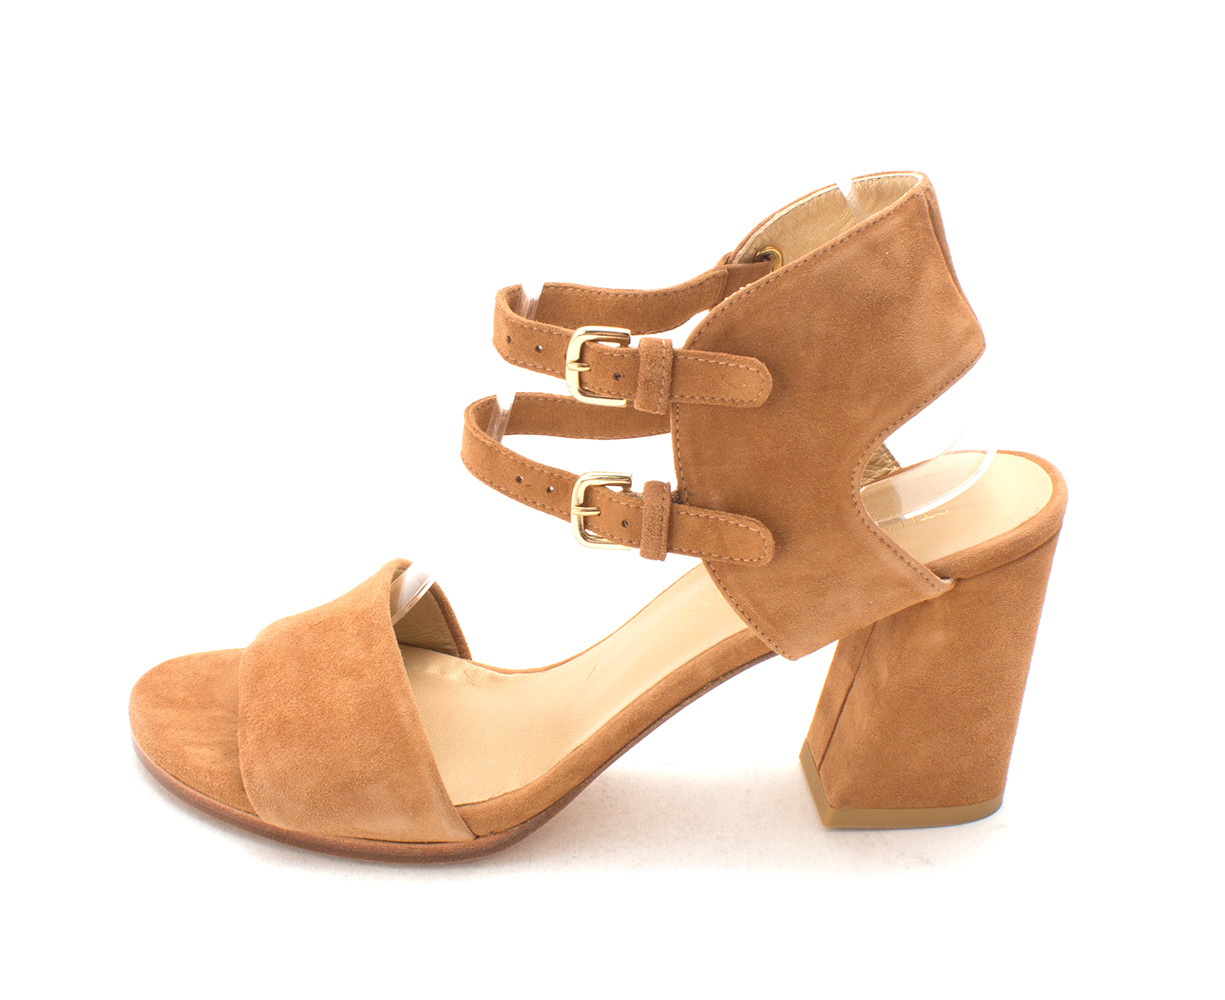 fe35357e2db9 Stuart Weitzman TwoWays Womens Heeled Sandals toffee sudede 9 US   7 ...